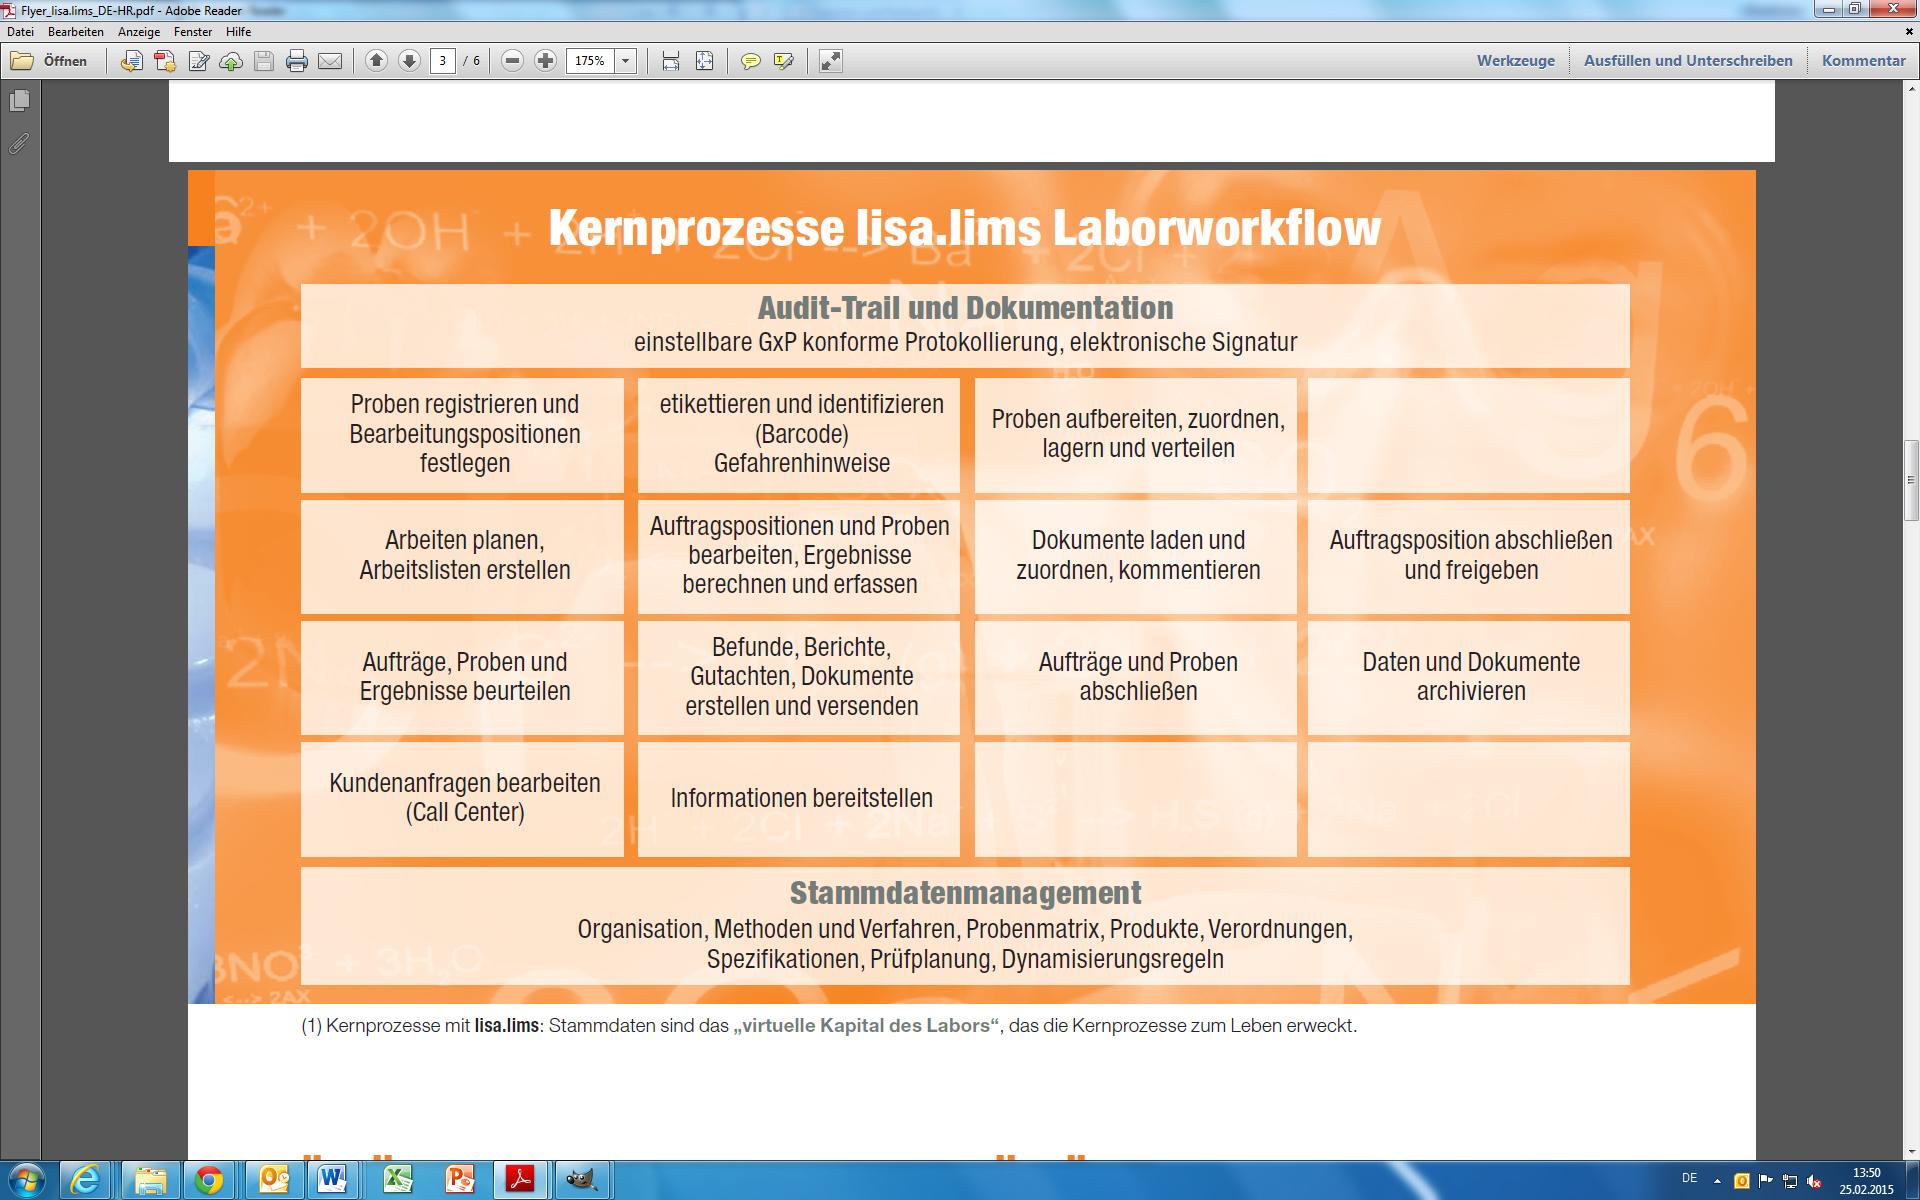 Kernprozesse lisa.lims Laborworkflow